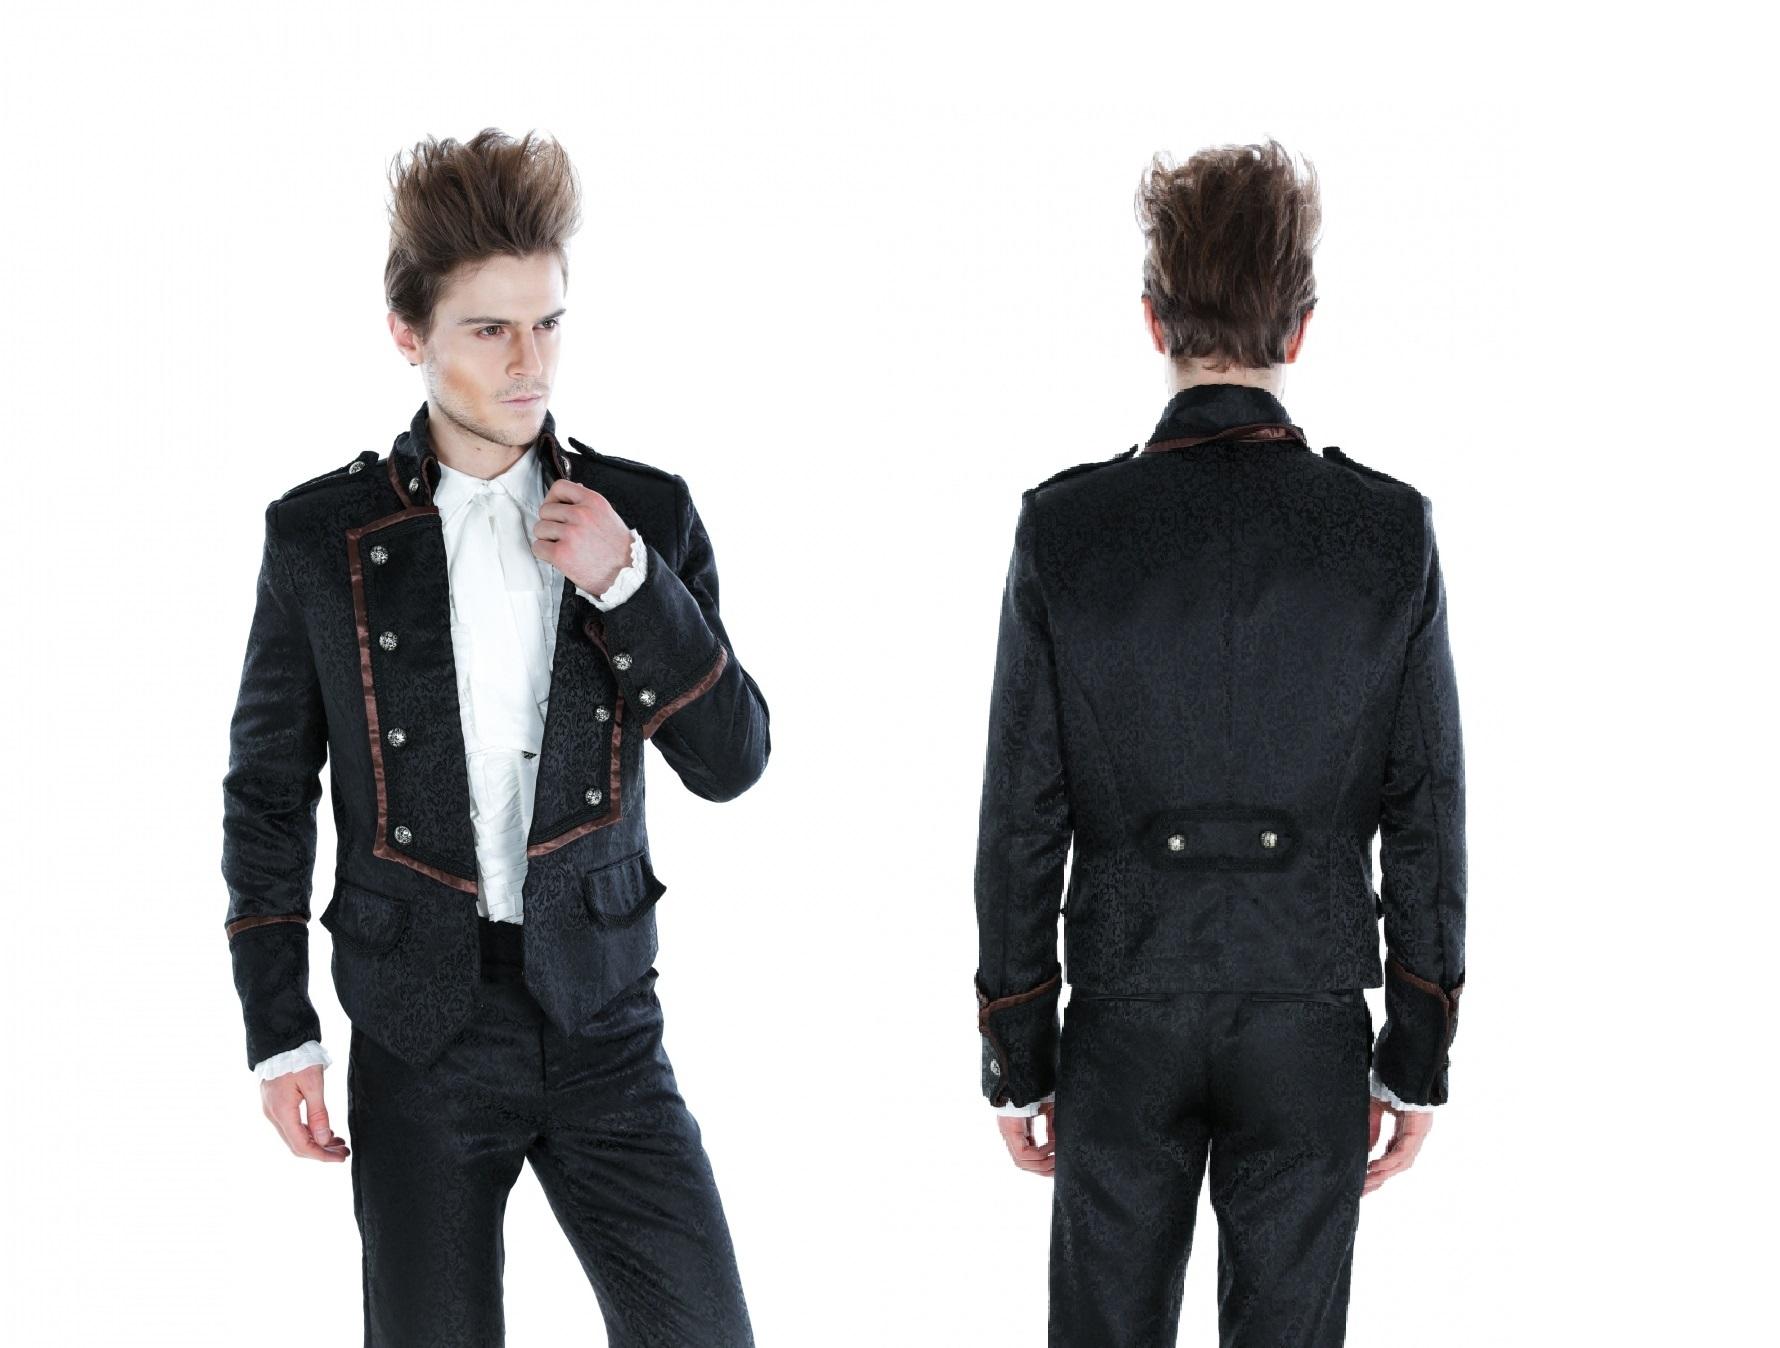 Pentagramme Black Brocade Jacket